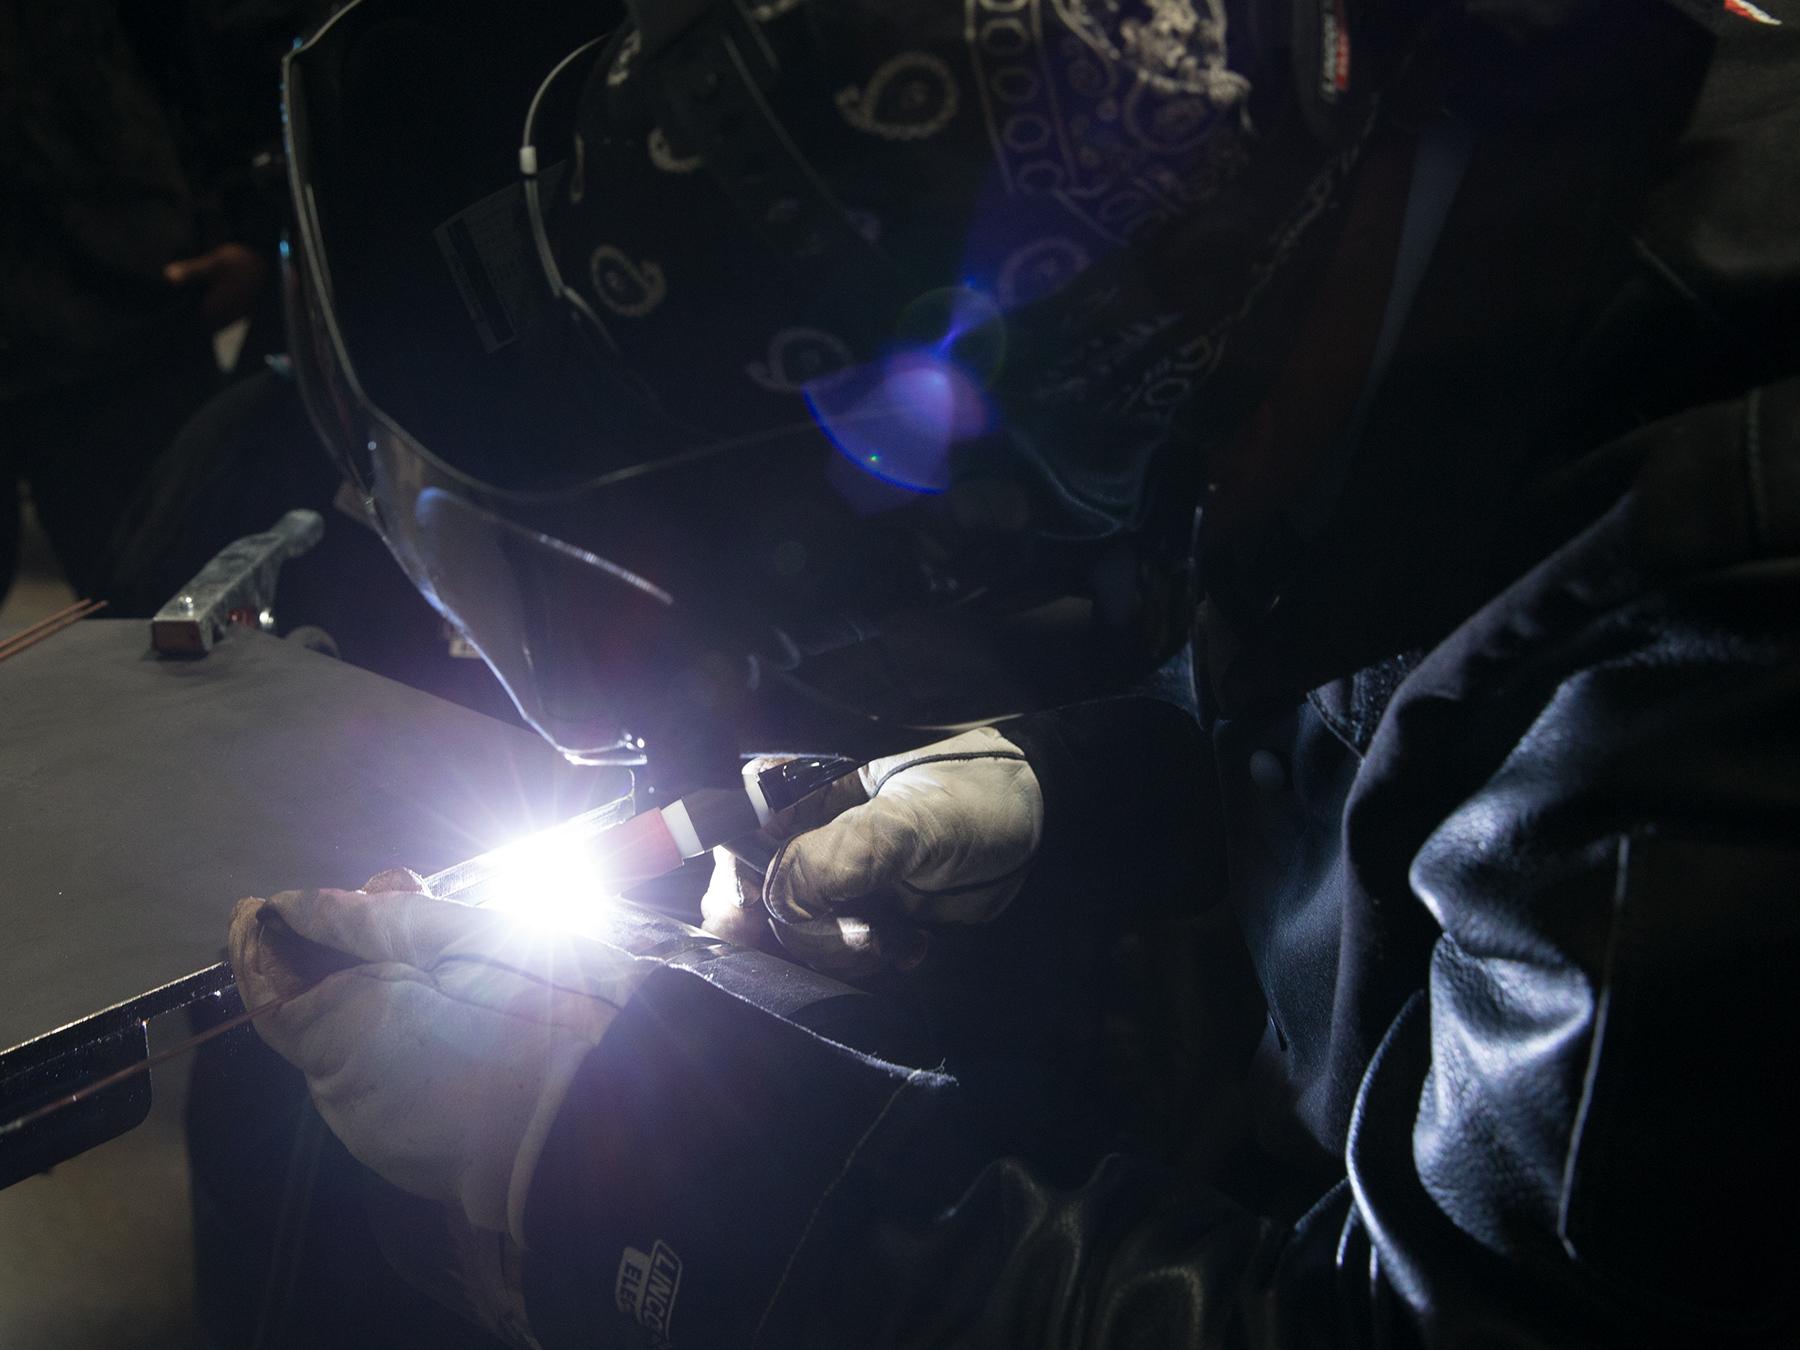 Welding student welding creating a bright light